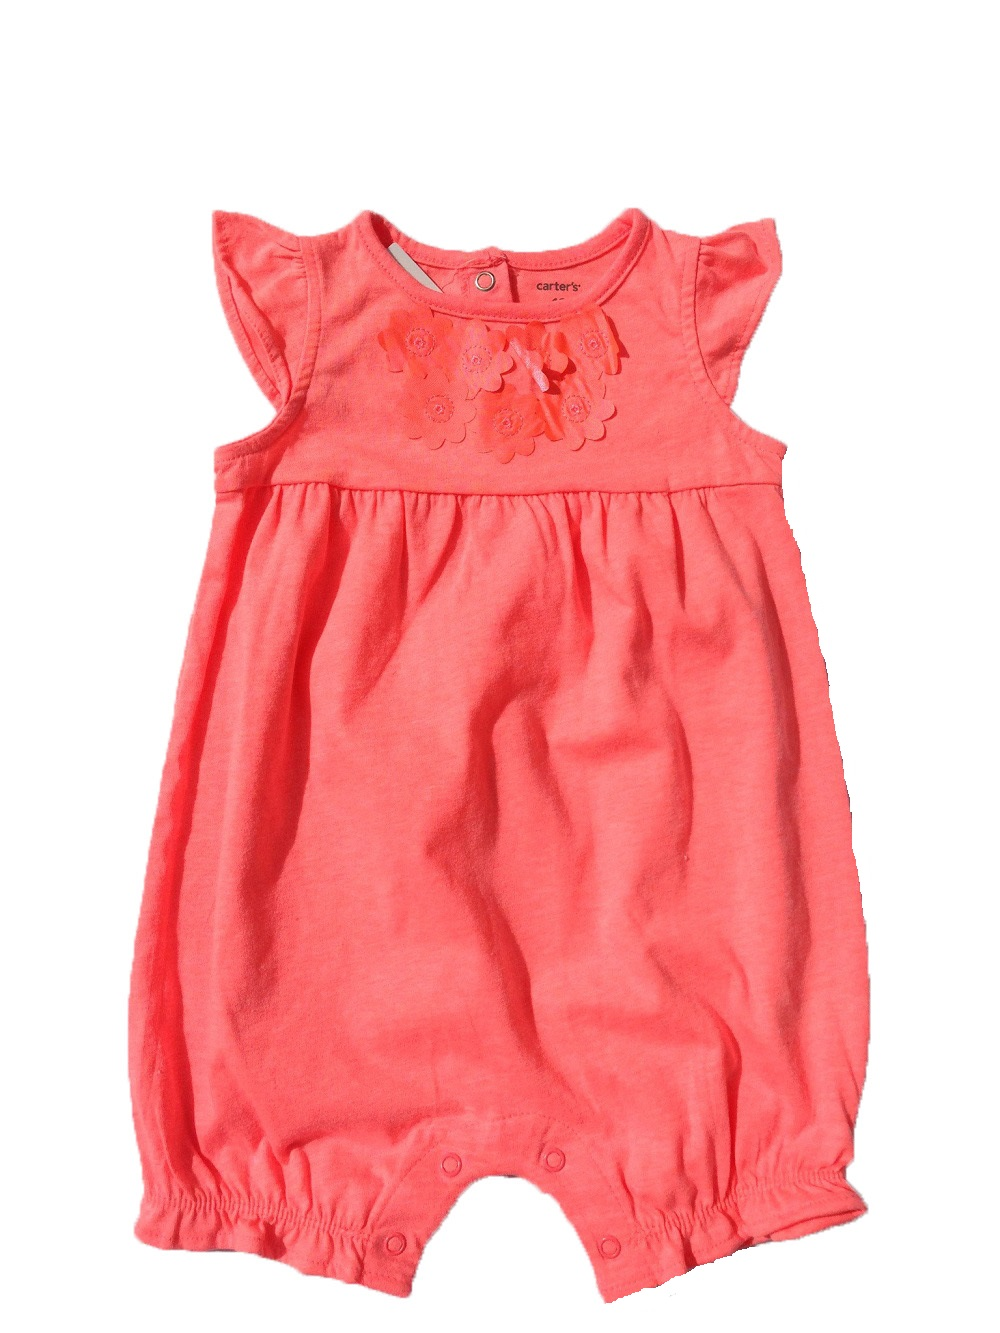 f9c2beba96e6 Carter s Baby Girls  Neon Orange Romper with Flower Applique (24 ...